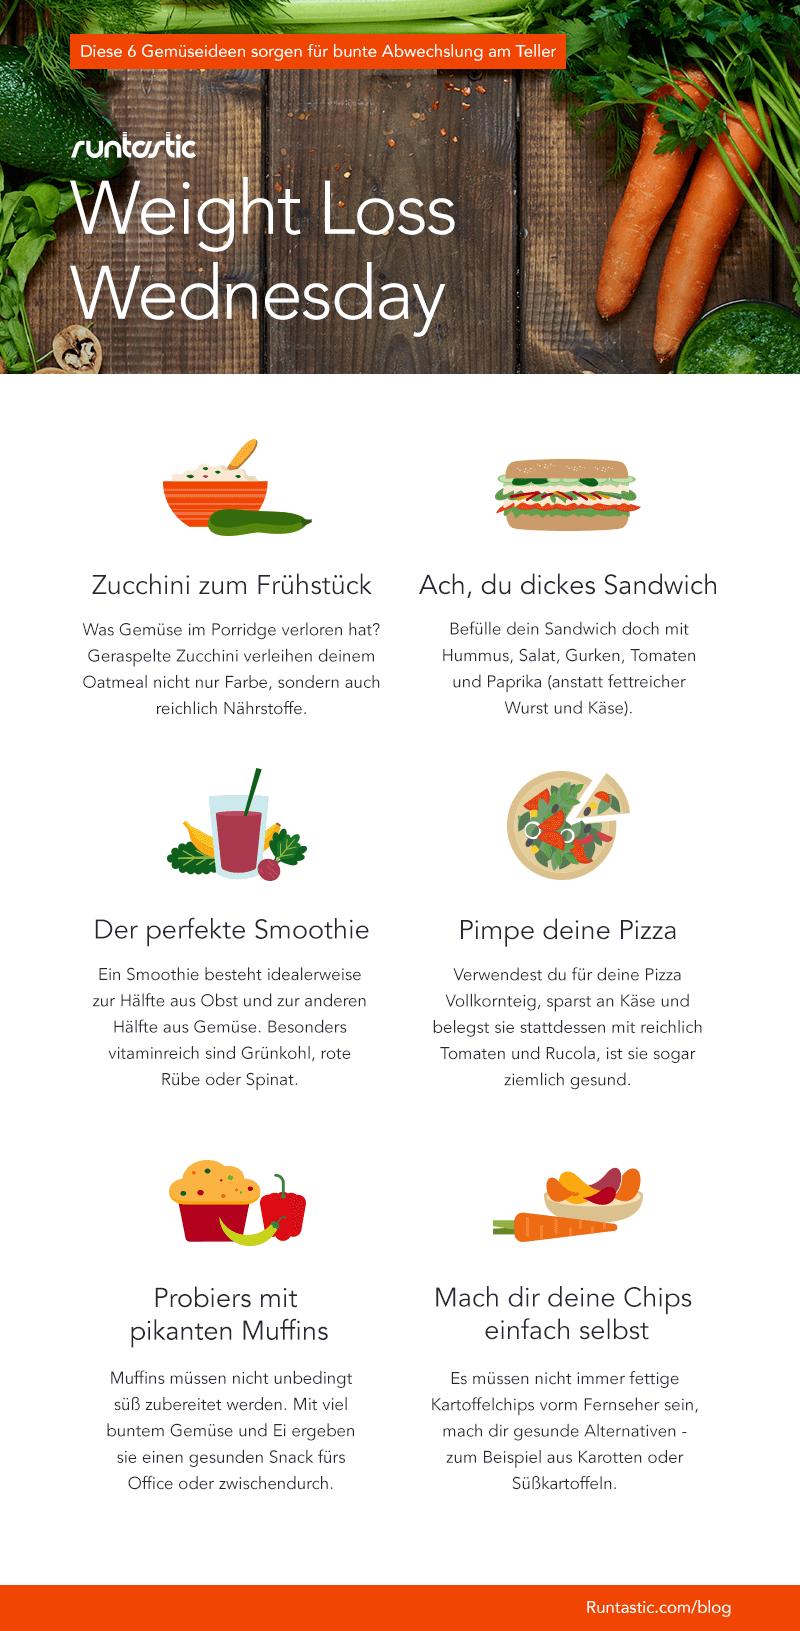 Weight Loss Wednesdays Gemüse